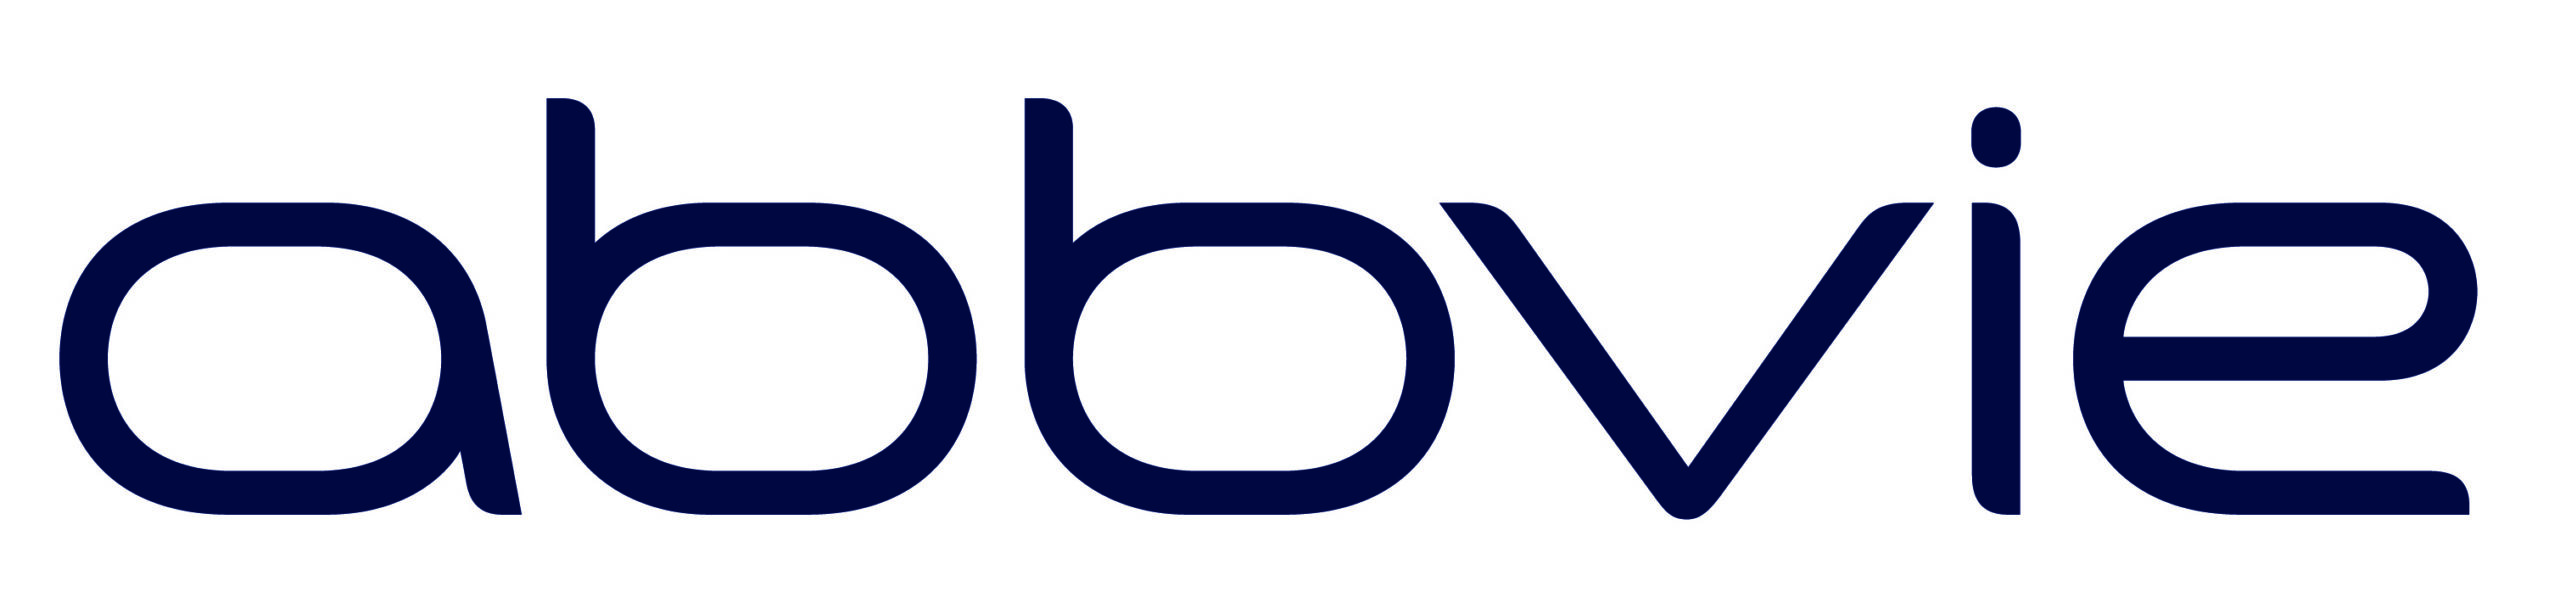 AbbVie research-driven biopharmaceutical company.